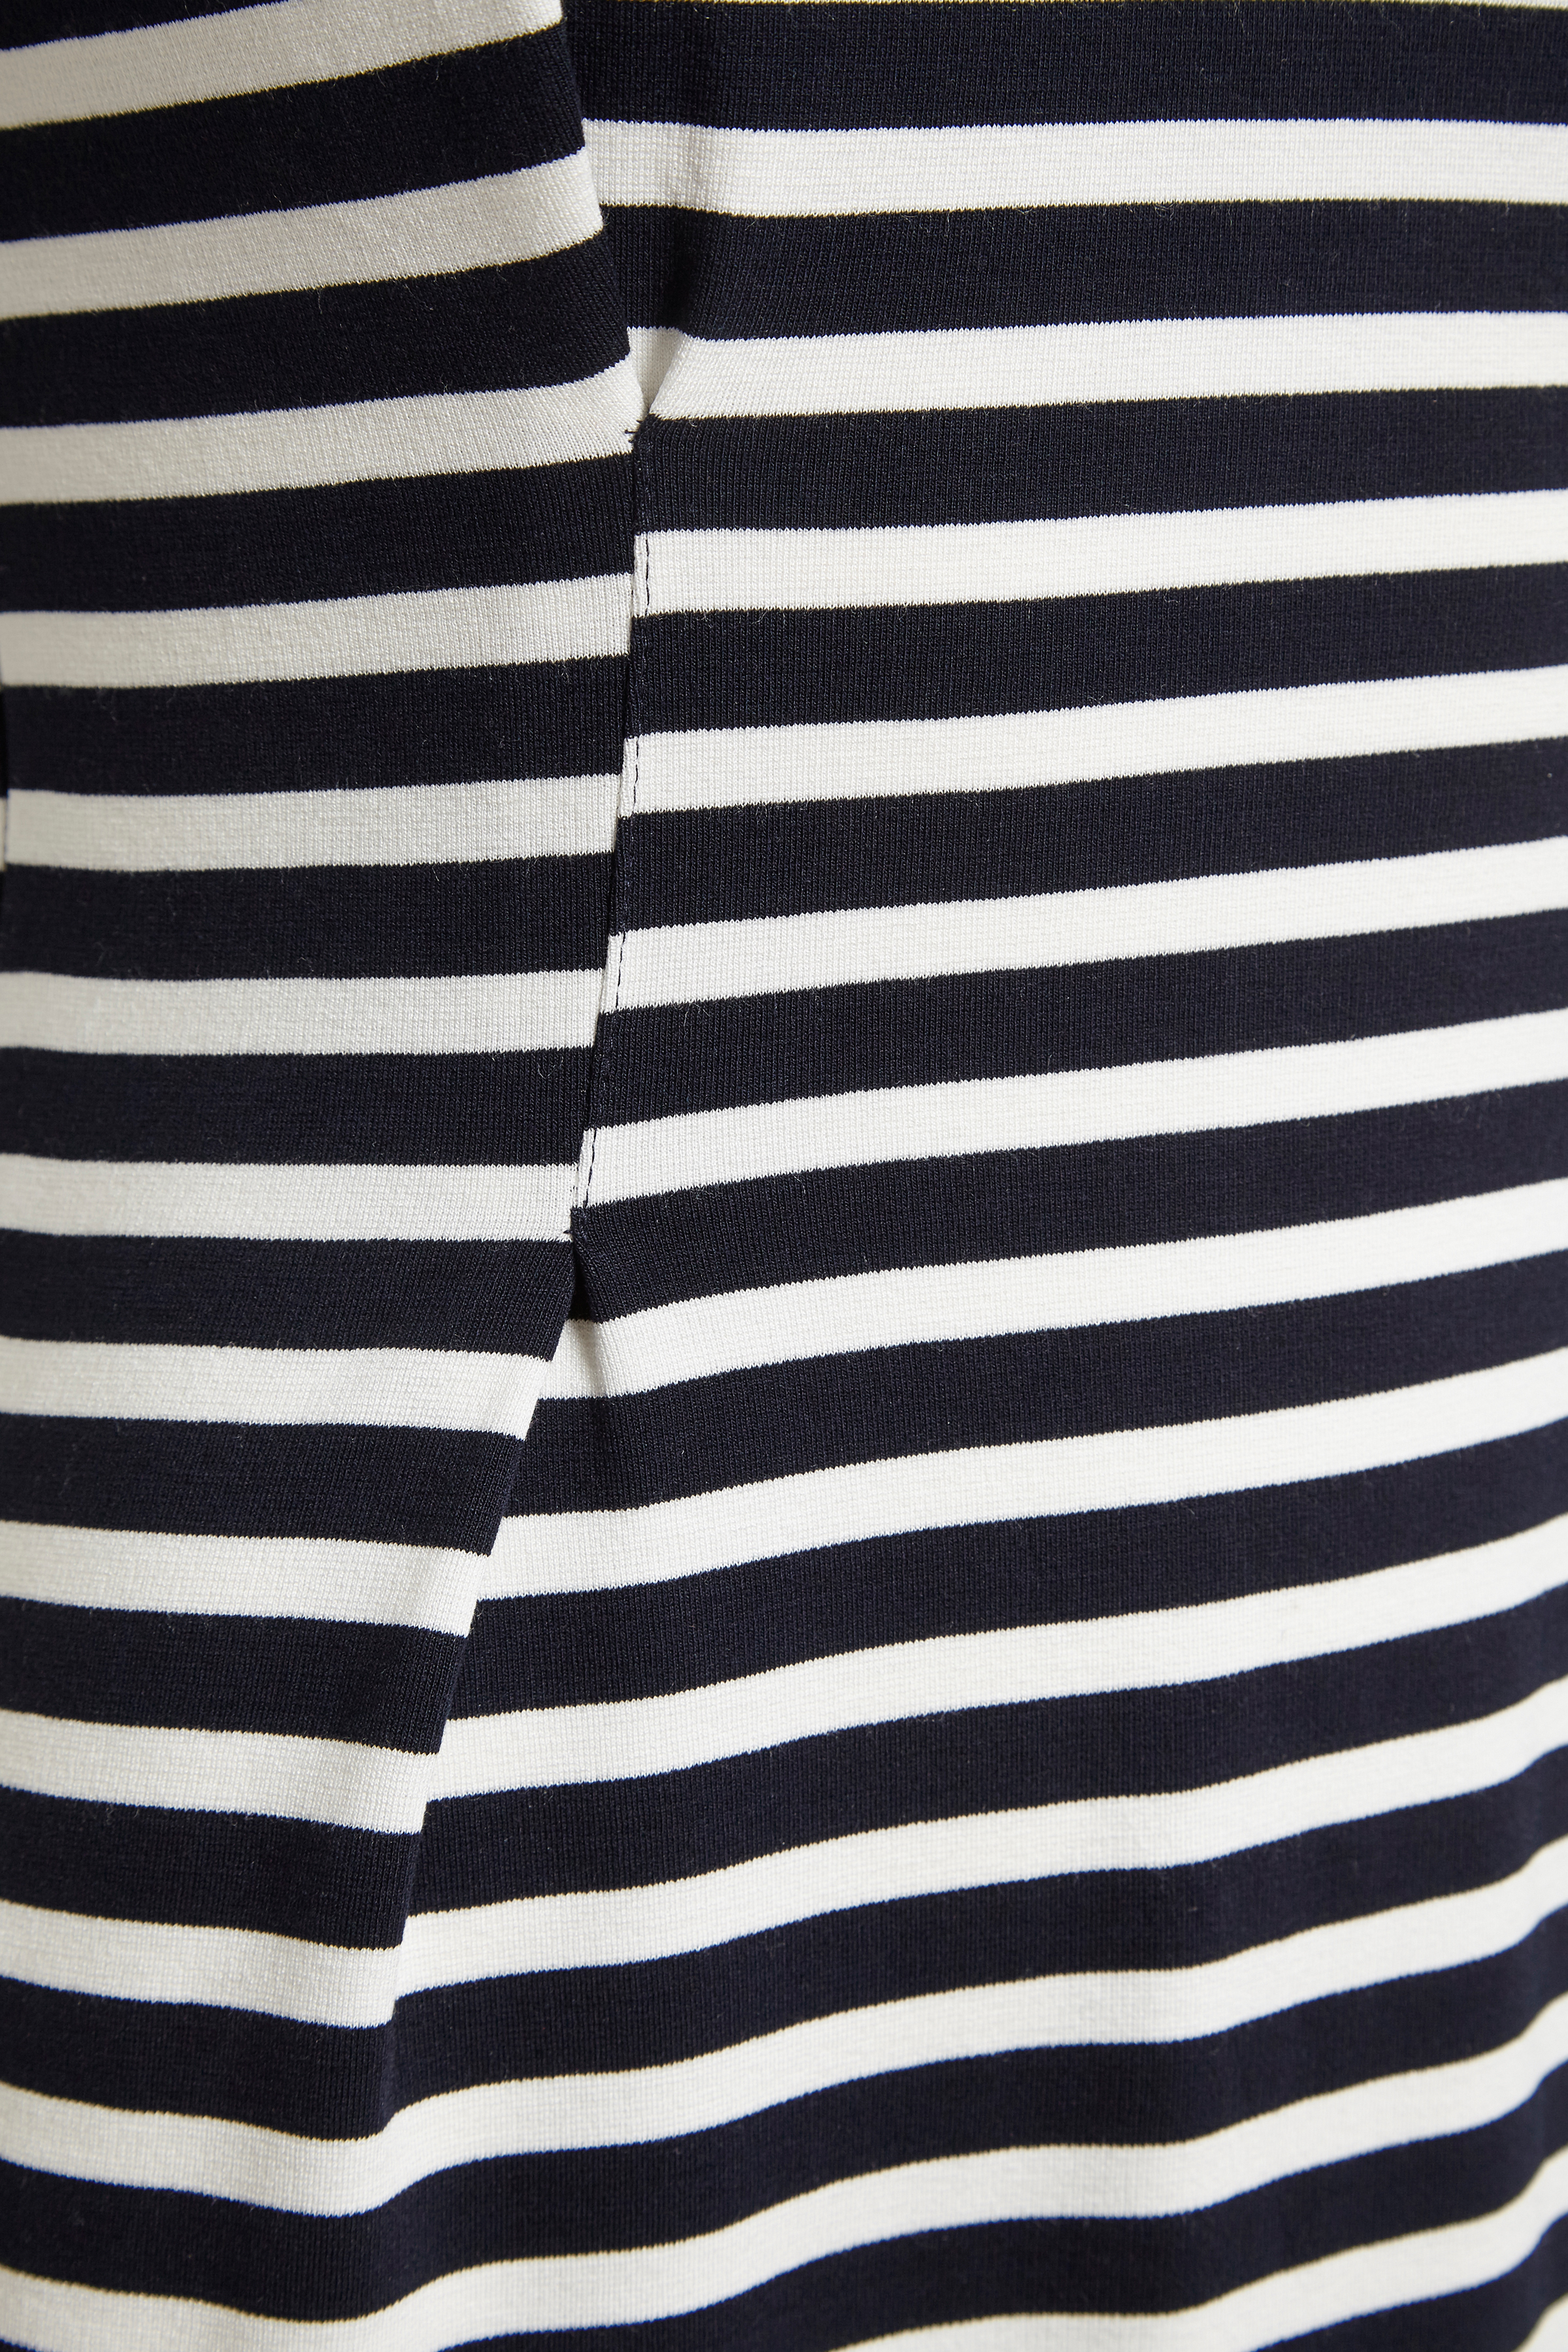 Blue Combi Jerseykjole – Køb Blue Combi Jerseykjole fra str. XXS-XXL her